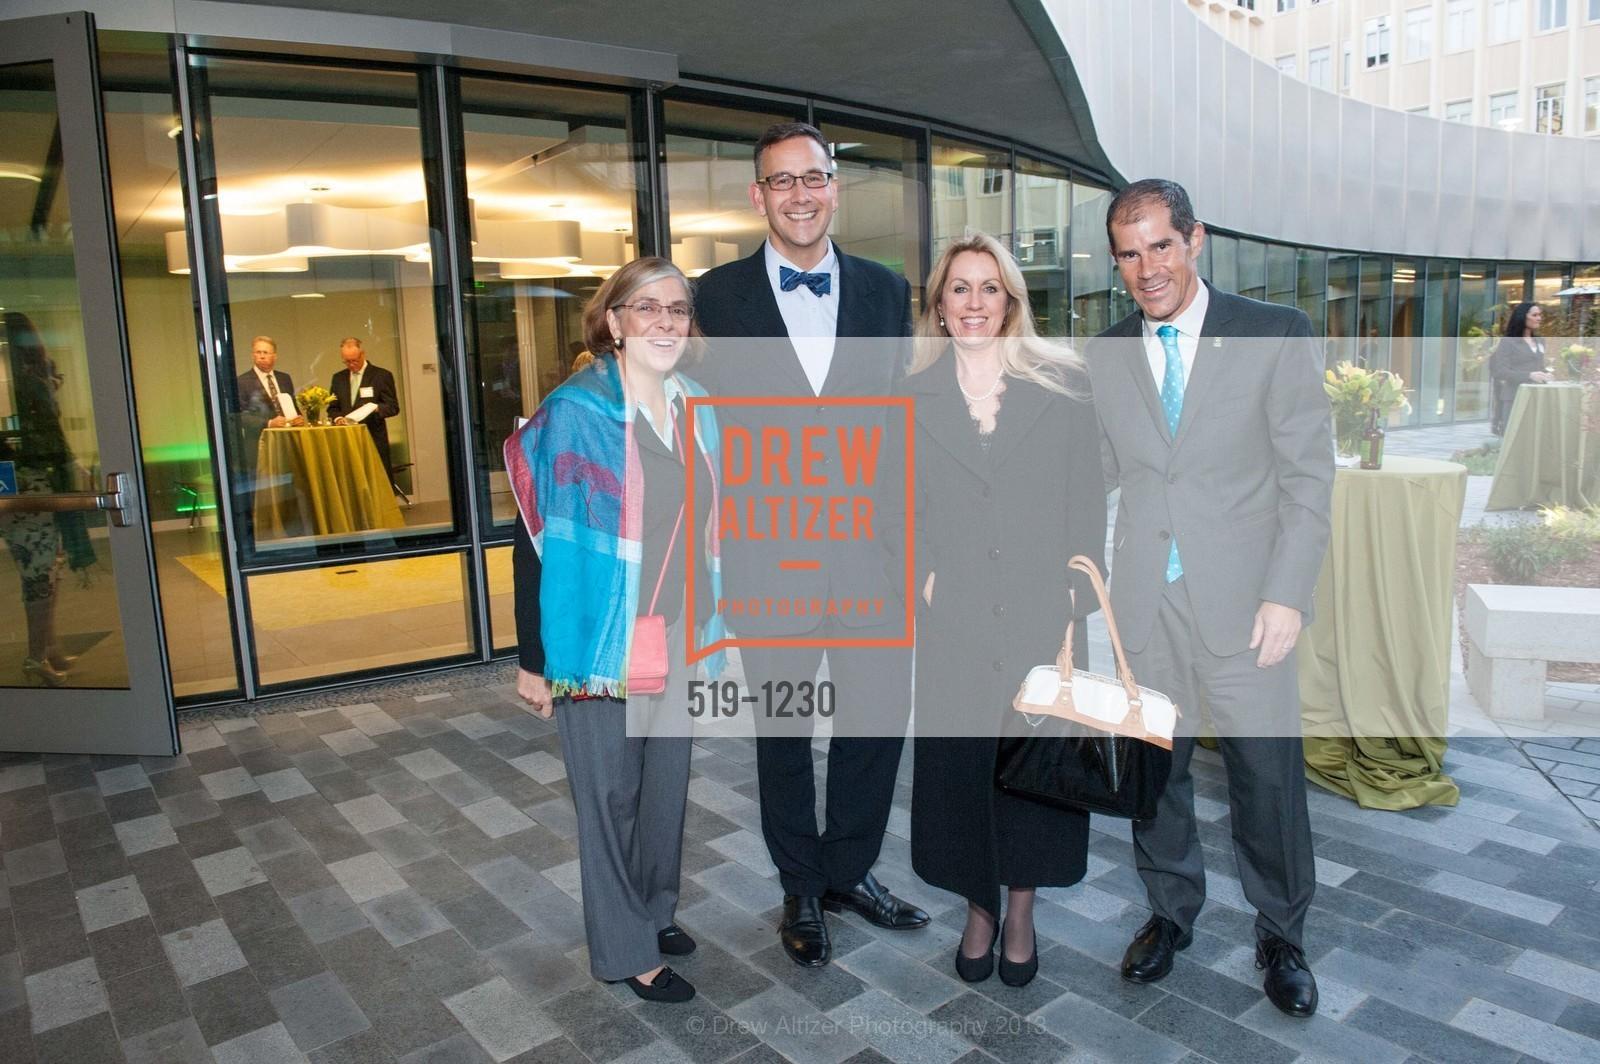 Elizabeth Hill, Peter Novak, Jenny Turbin, Chris Nicholson, Photo #519-1230